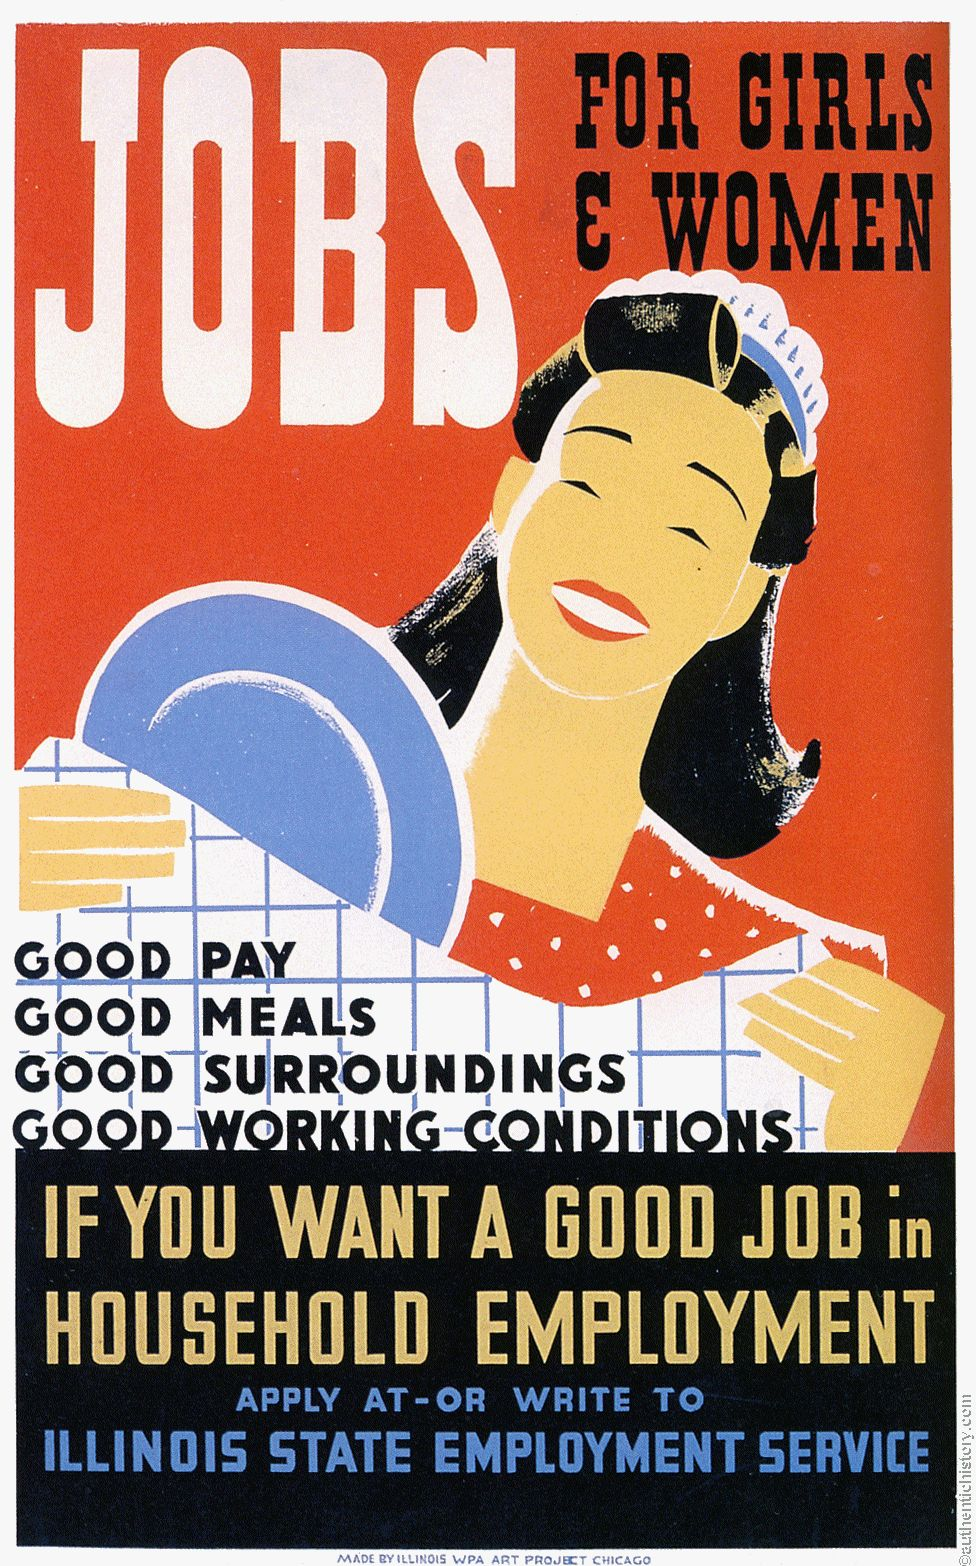 WPA_Art_Project_Poster-Jobs_For_Girls_and_Women-Albert_M_Bender.jpg